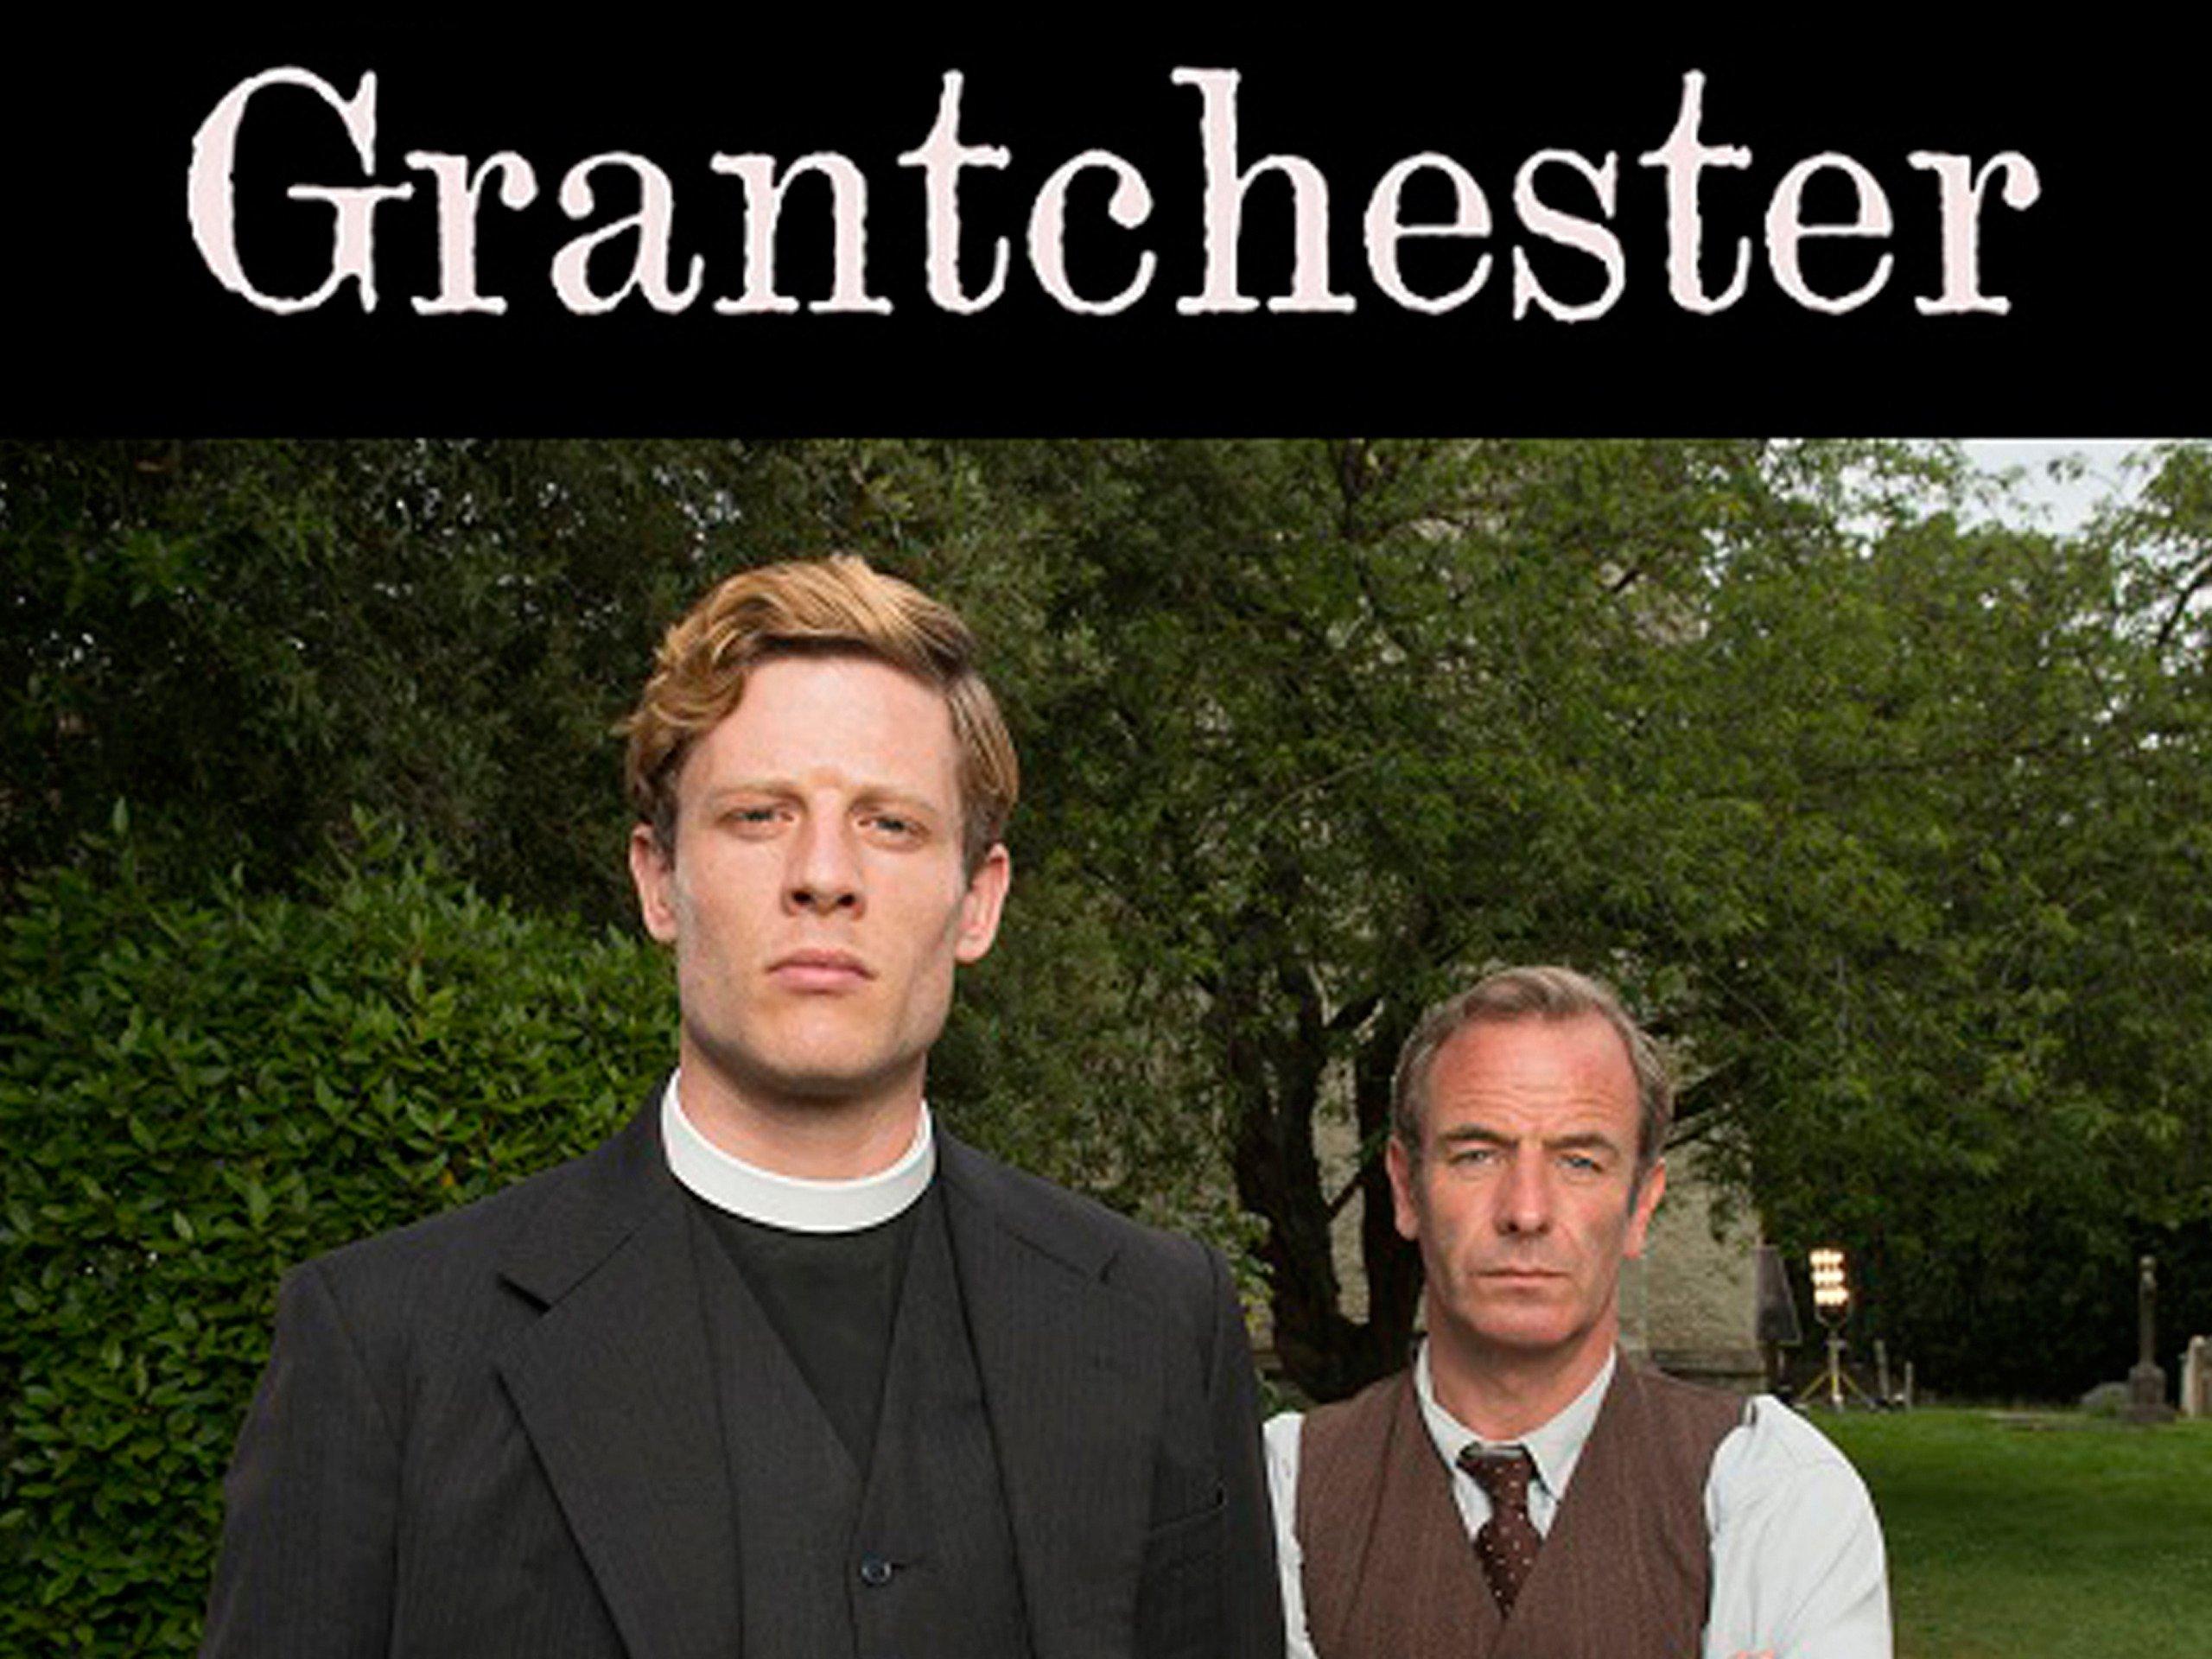 grantchester.jpg